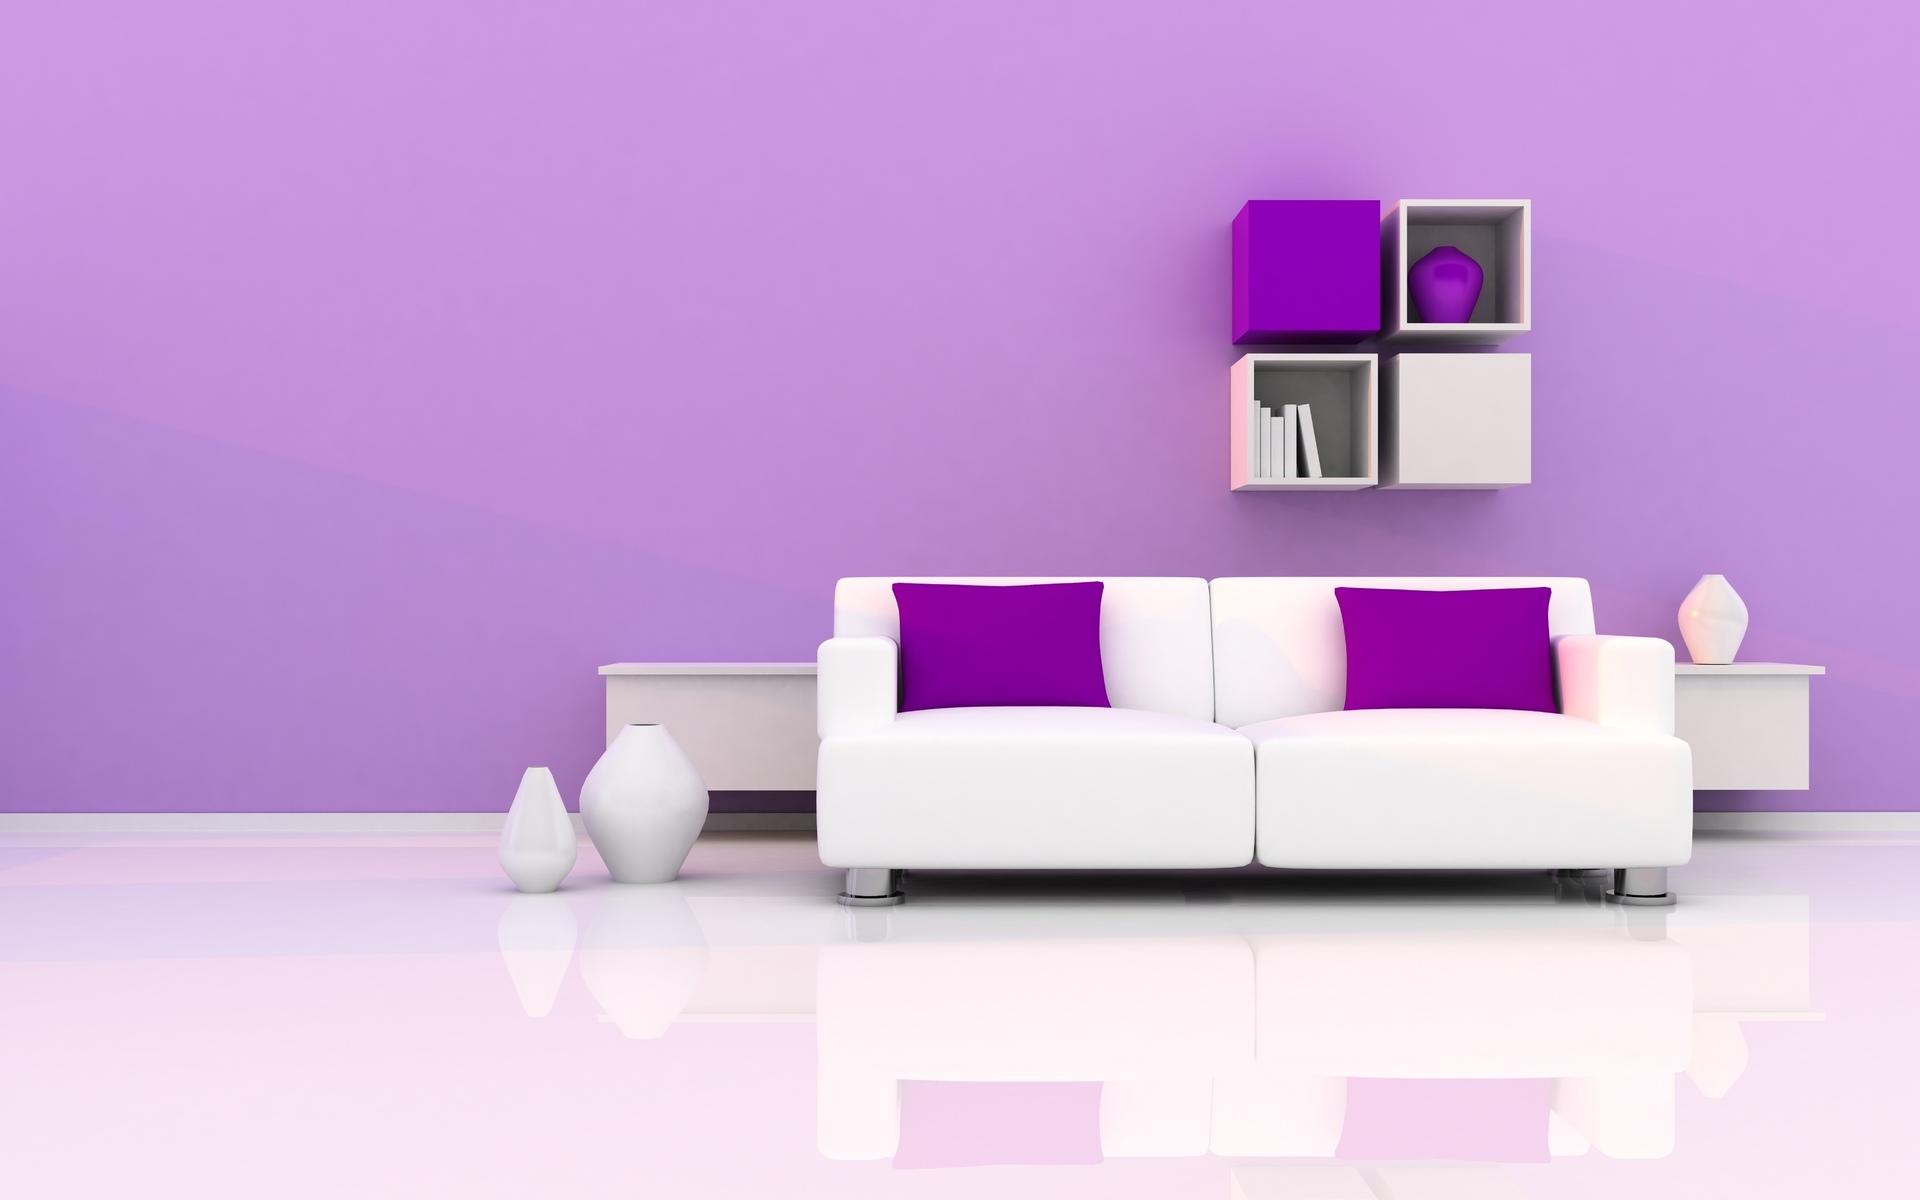 Interior Design Furniture Room Wallpaper 1920x1200 70068